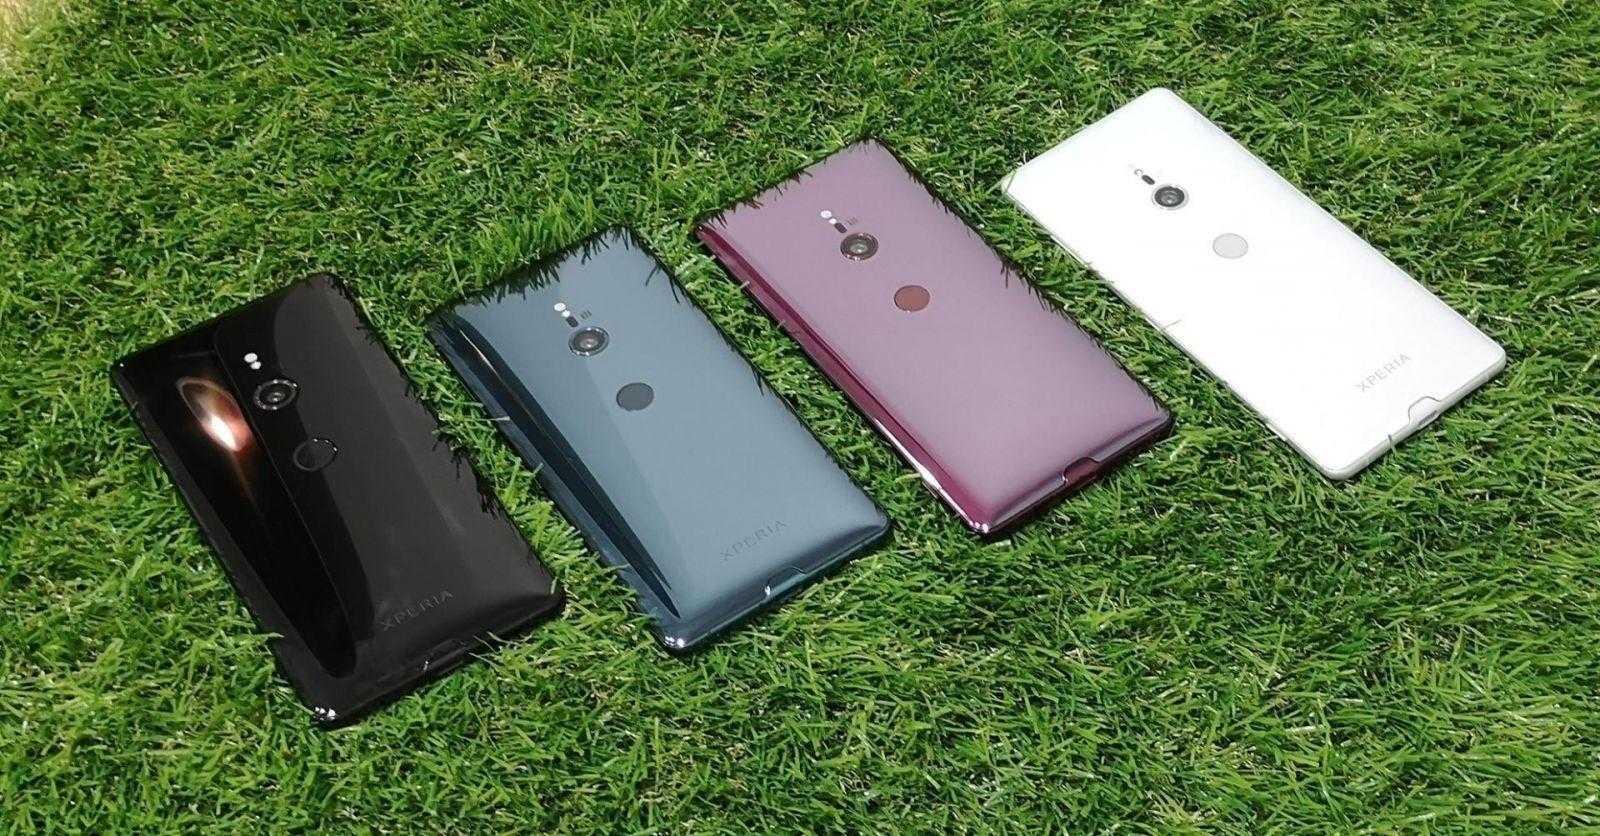 Sony привезла флагман Xperia XZ3 в Россию и объявила цены в рублях